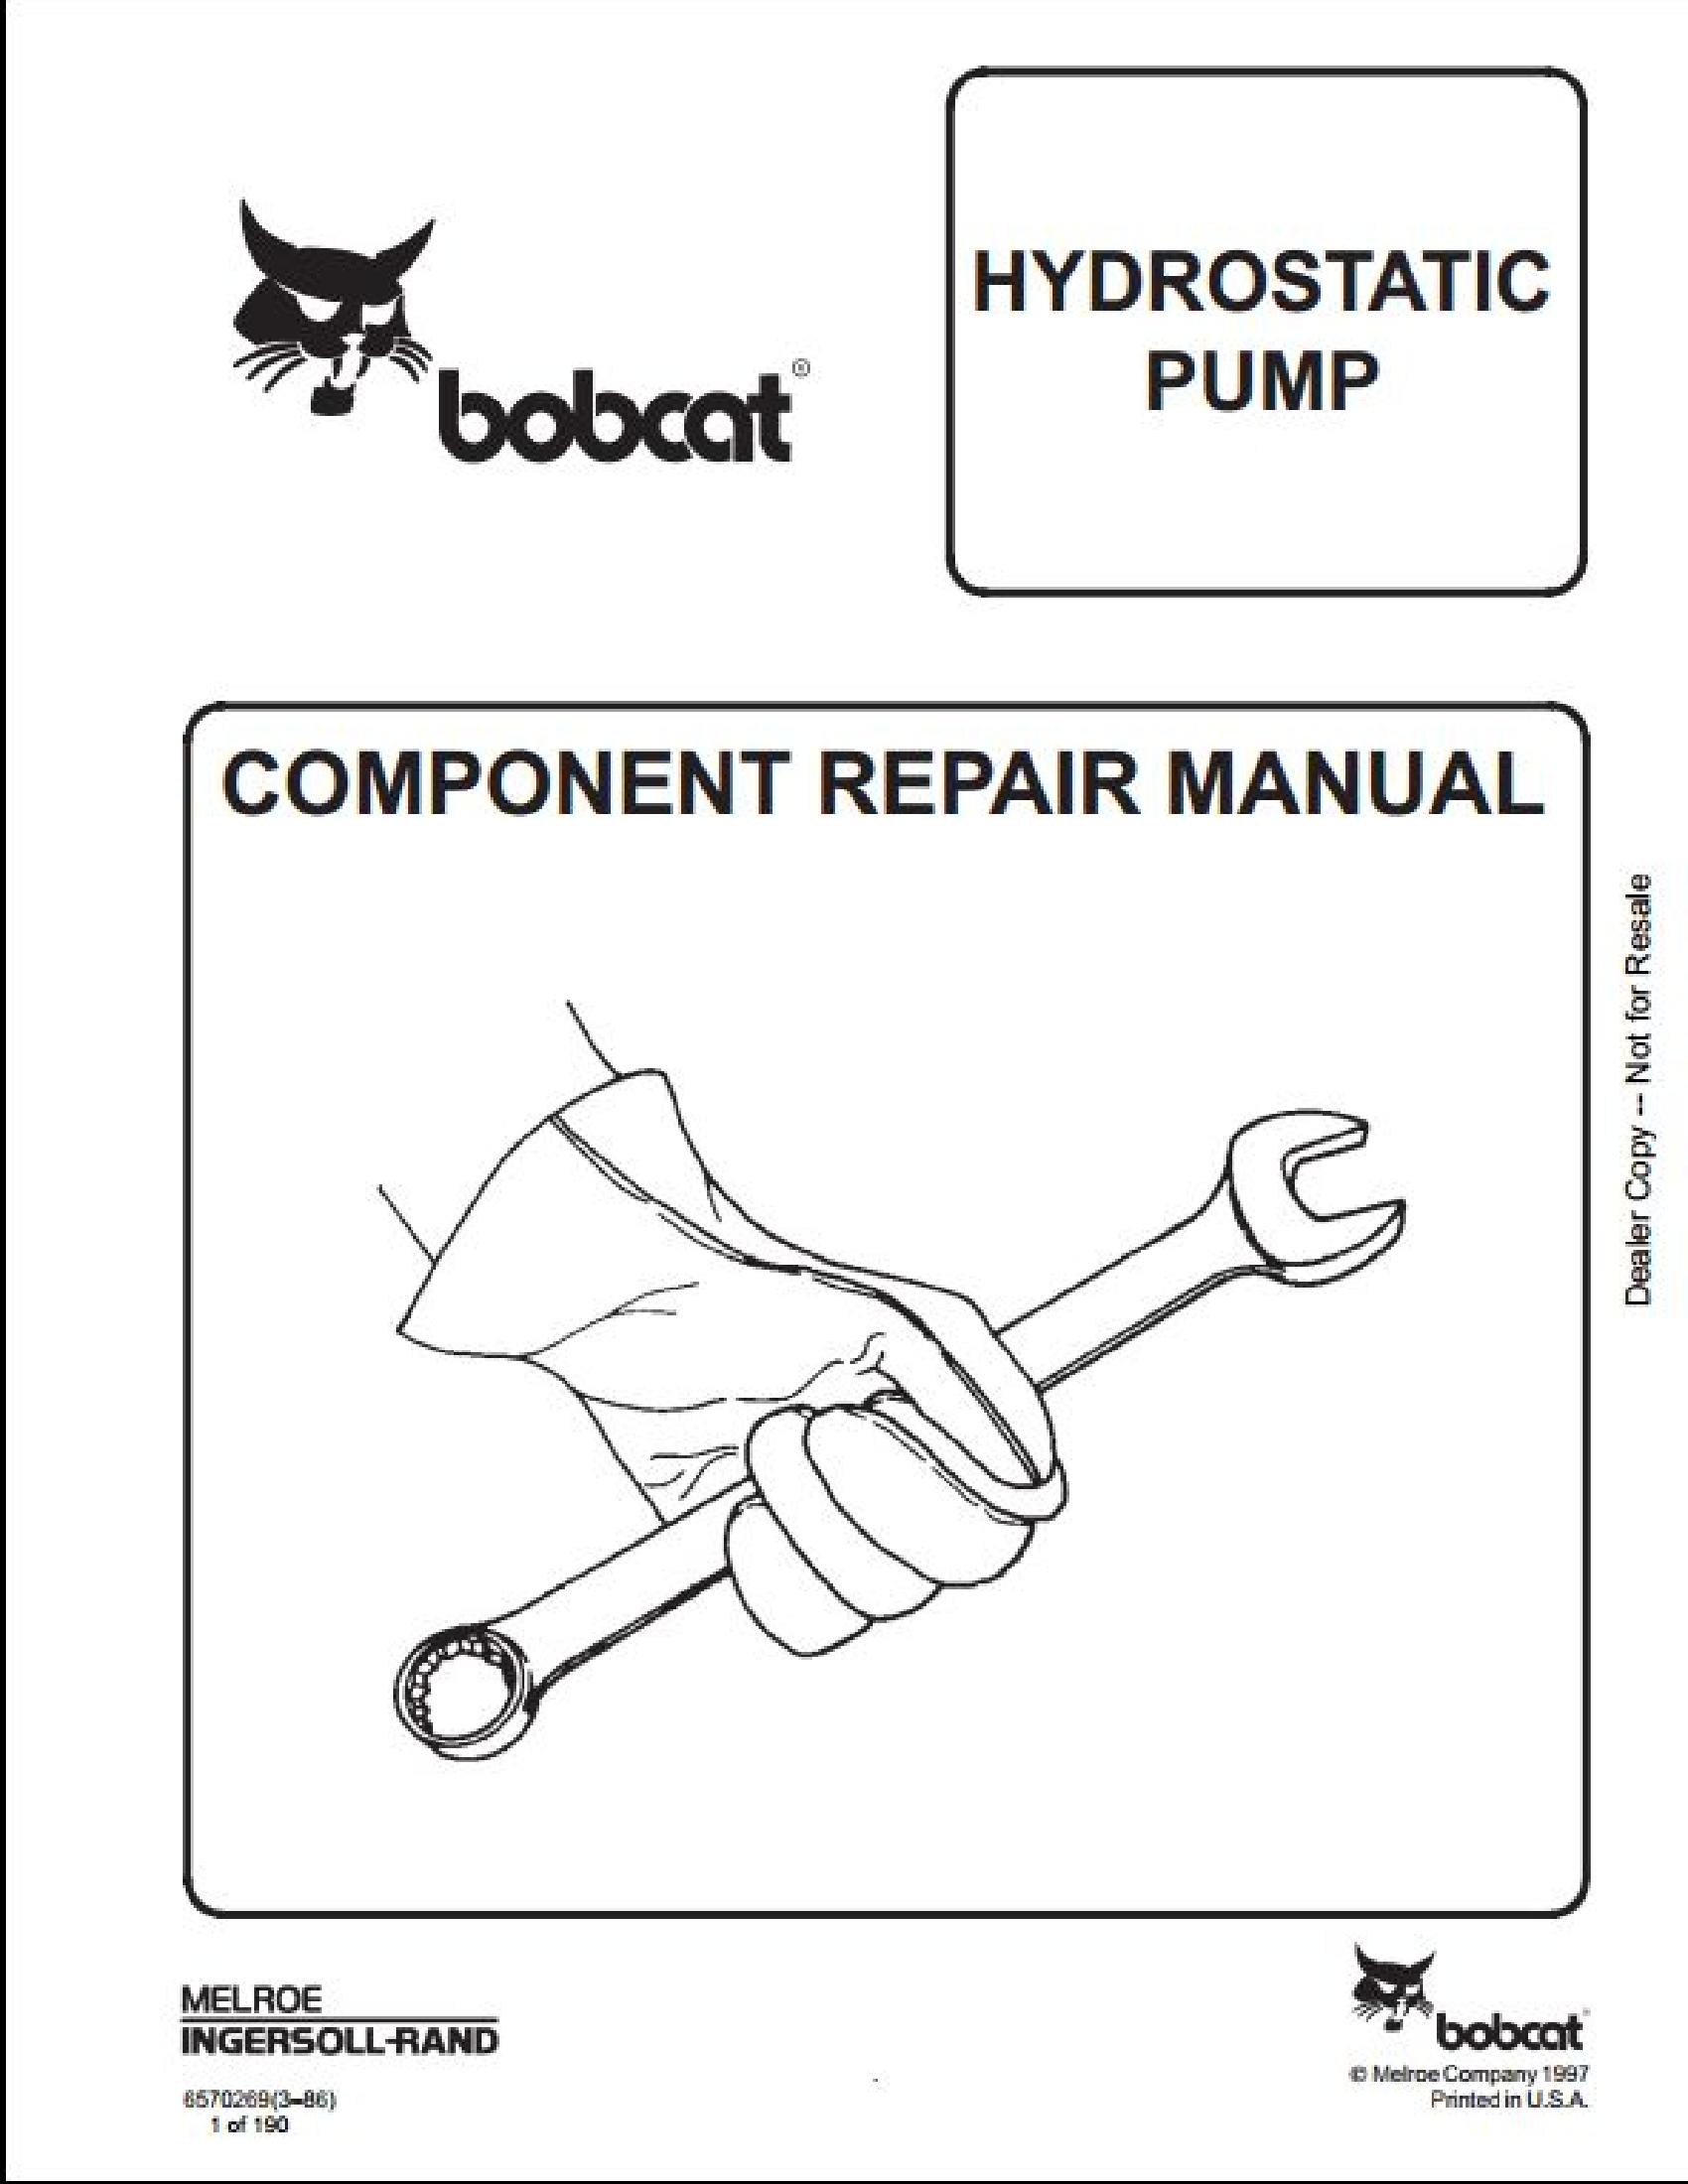 Bobcat 641 Skid Steer Loader Manual In 2020